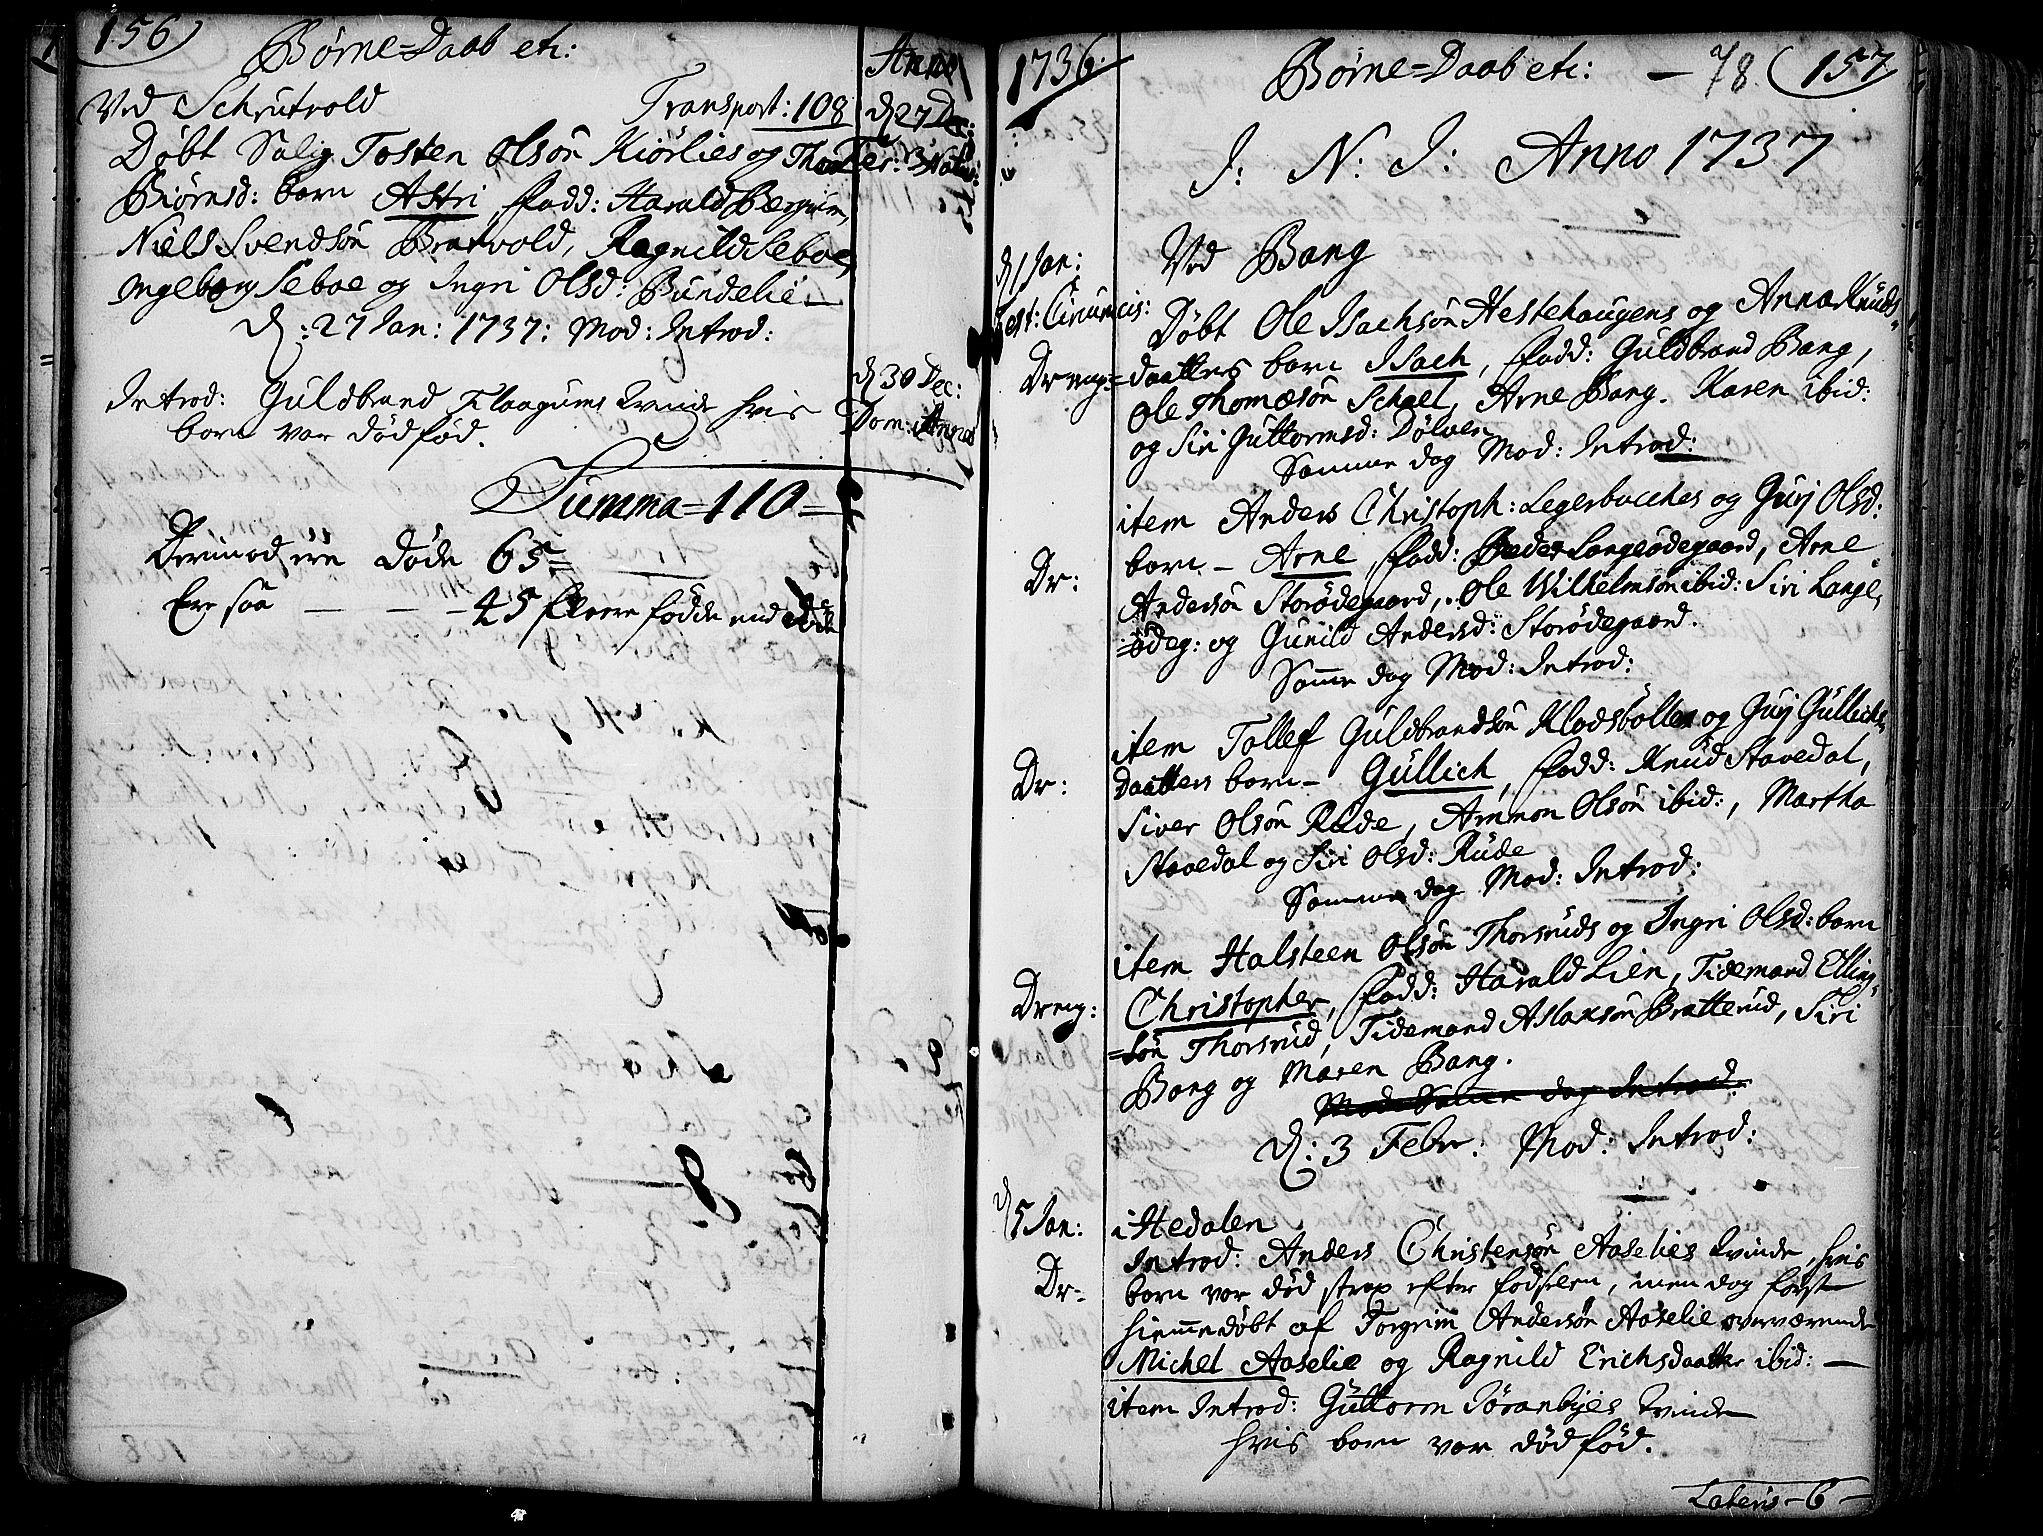 SAH, Aurdal prestekontor, Ministerialbok nr. 4, 1730-1762, s. 156-157